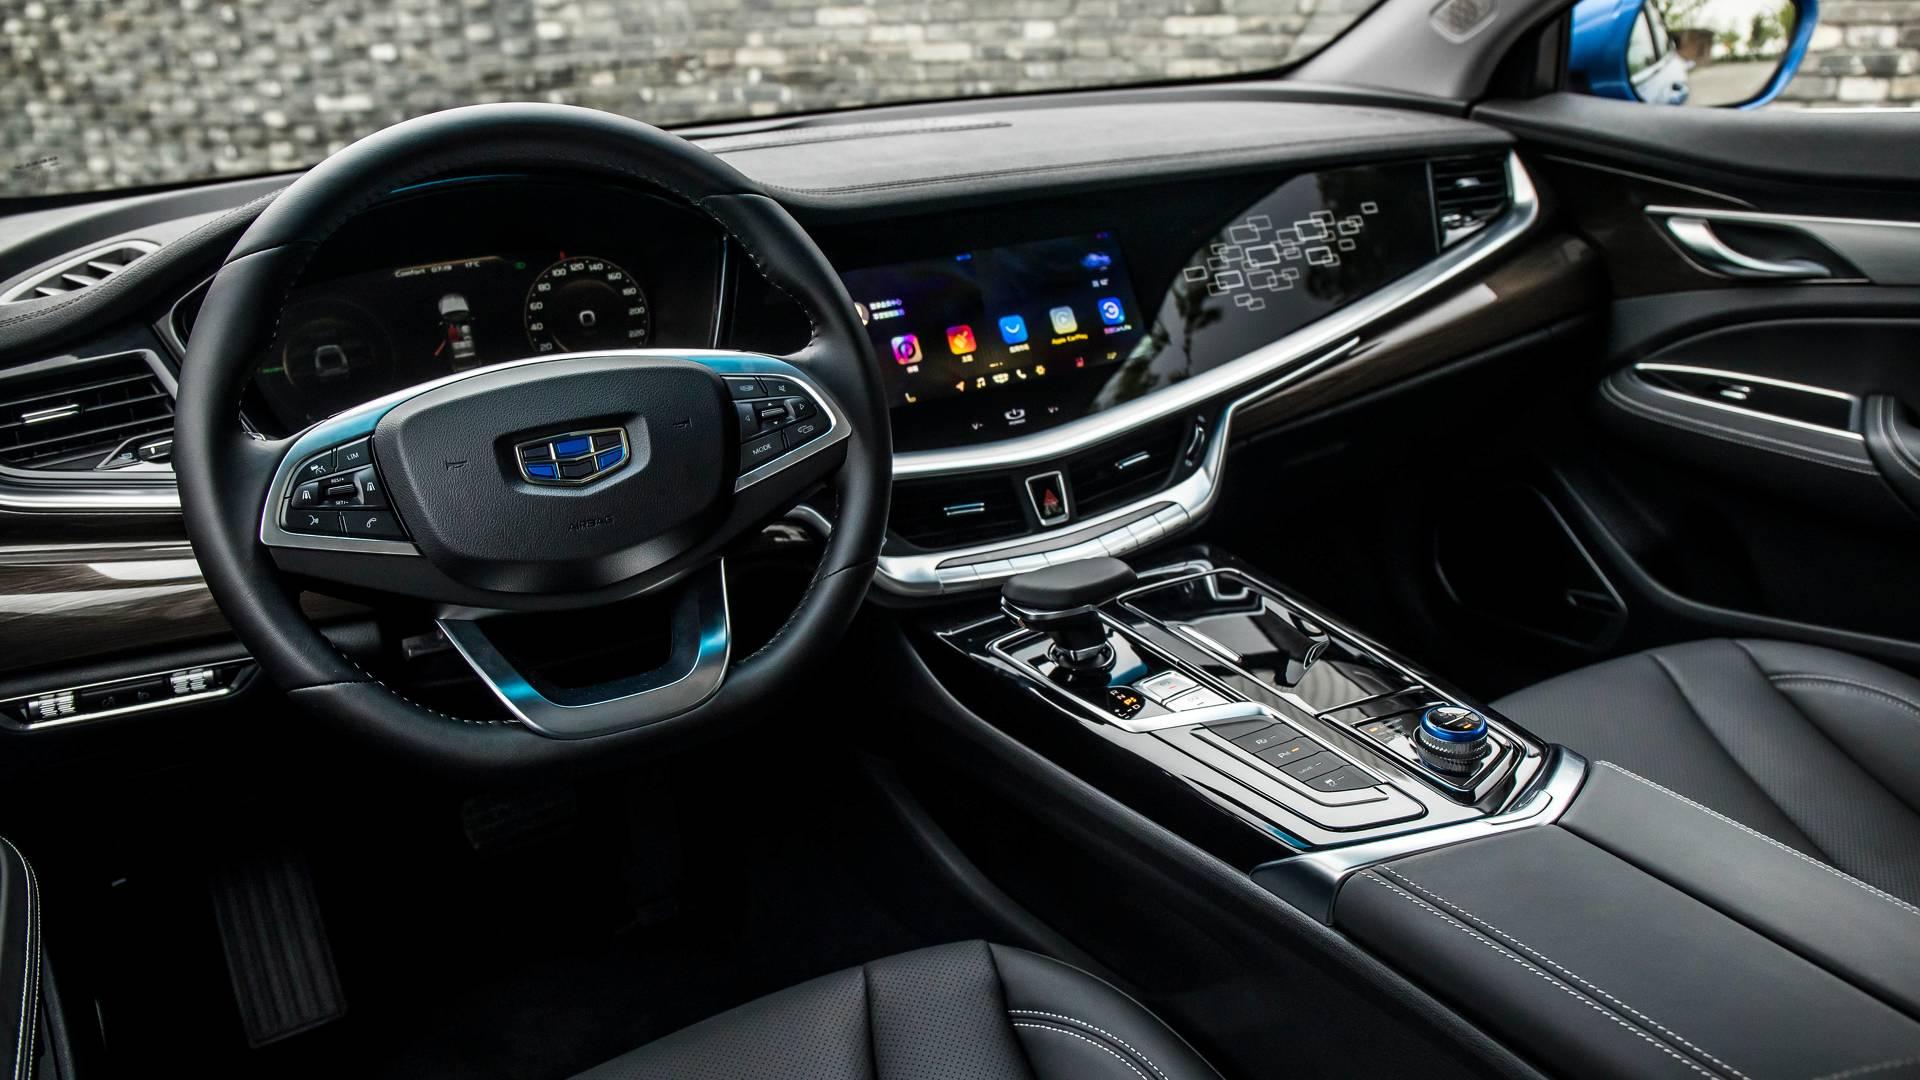 Geely Den Volvo Destekli Premium Model Bo Rui Ge Otopark Com